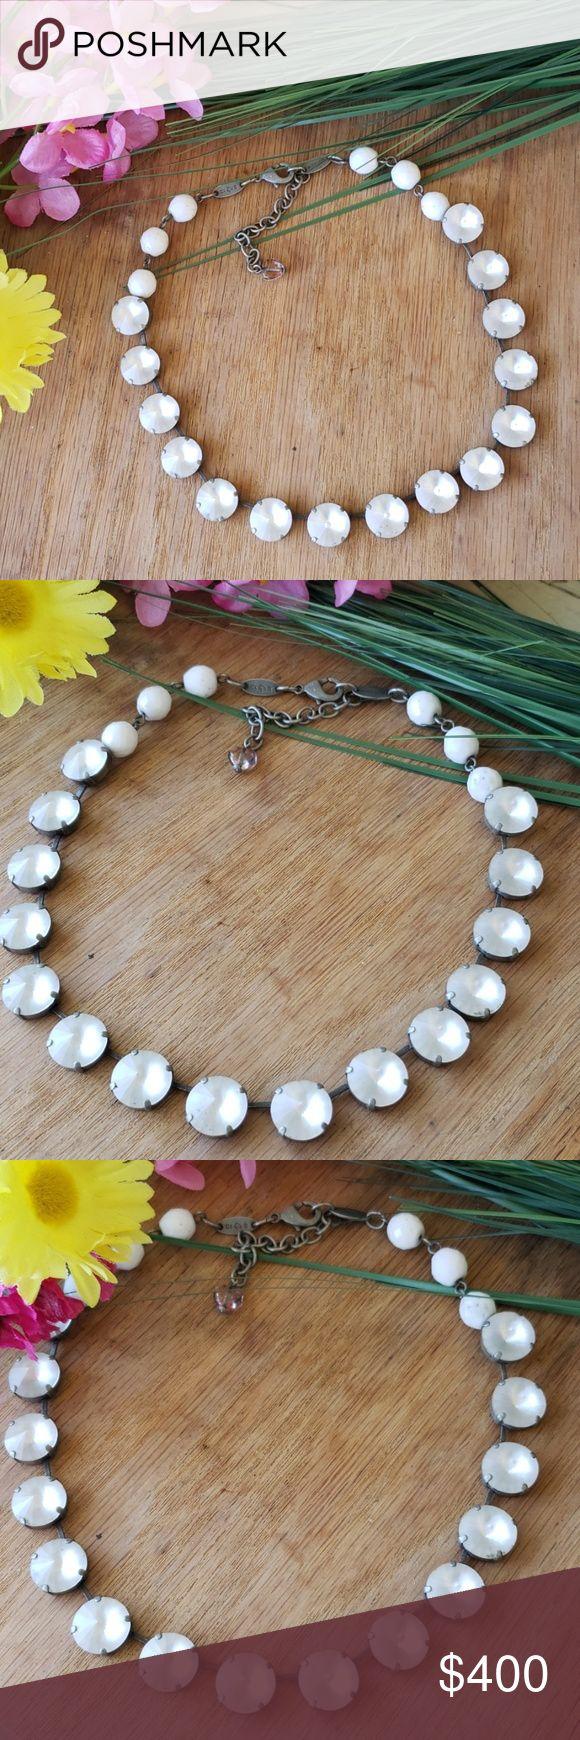 Sabika necklace Brautiful, unique, white jeweled, clouded